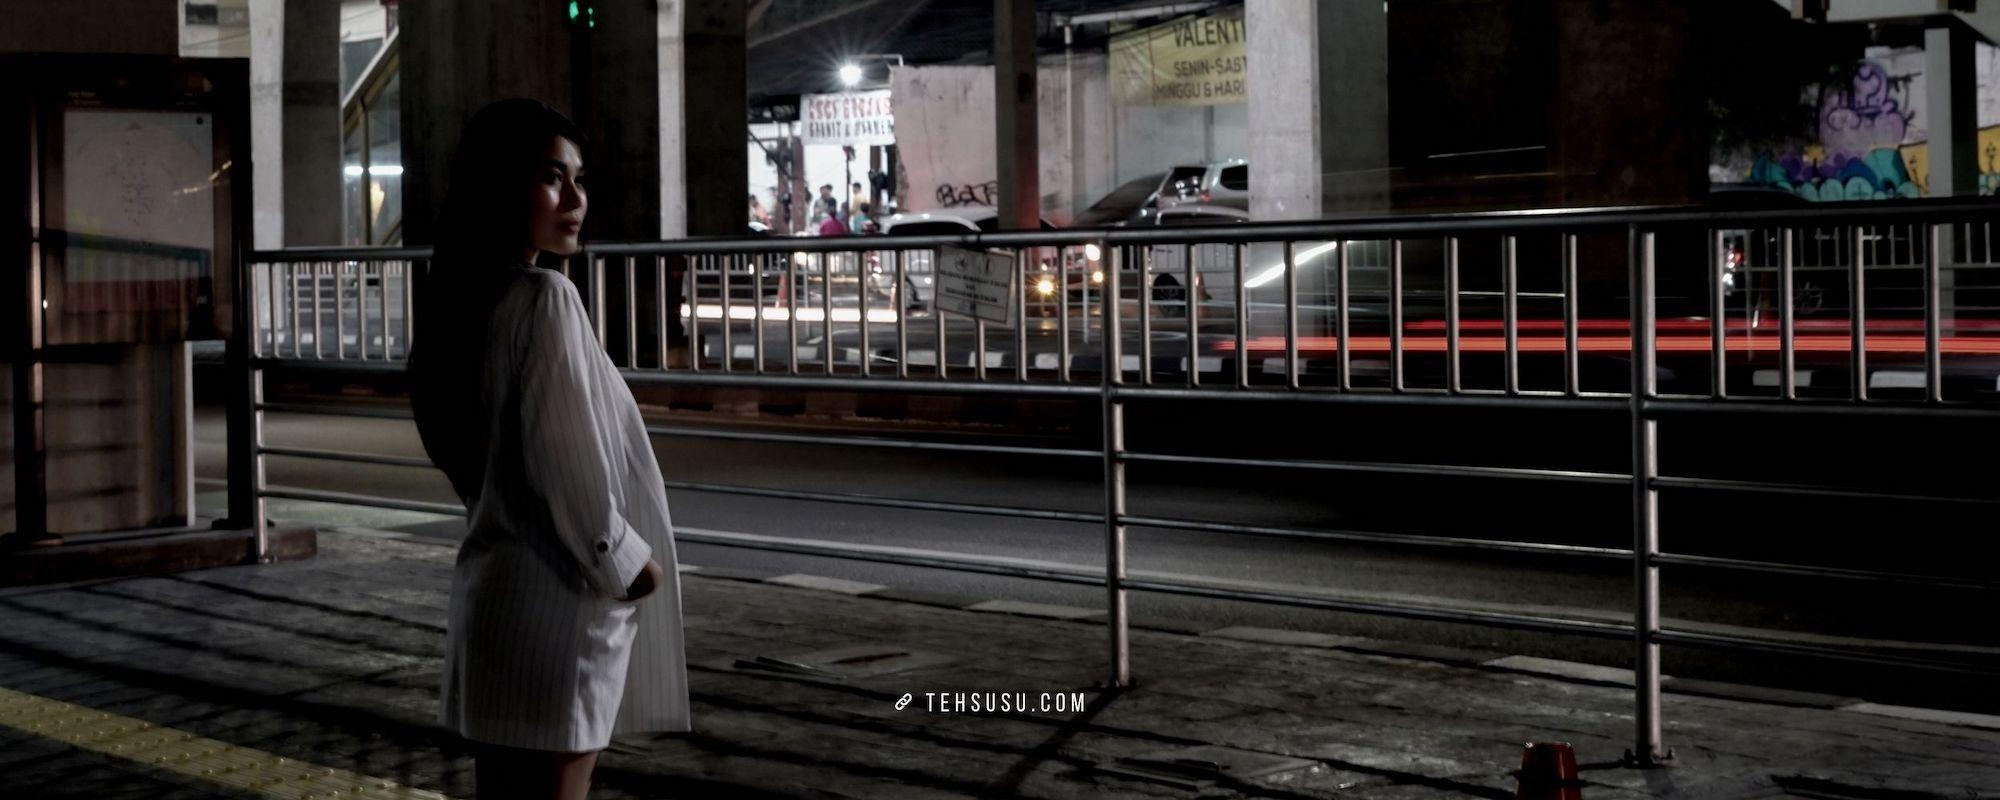 Cara Memotret Street Fashion Photography di Malam Hari